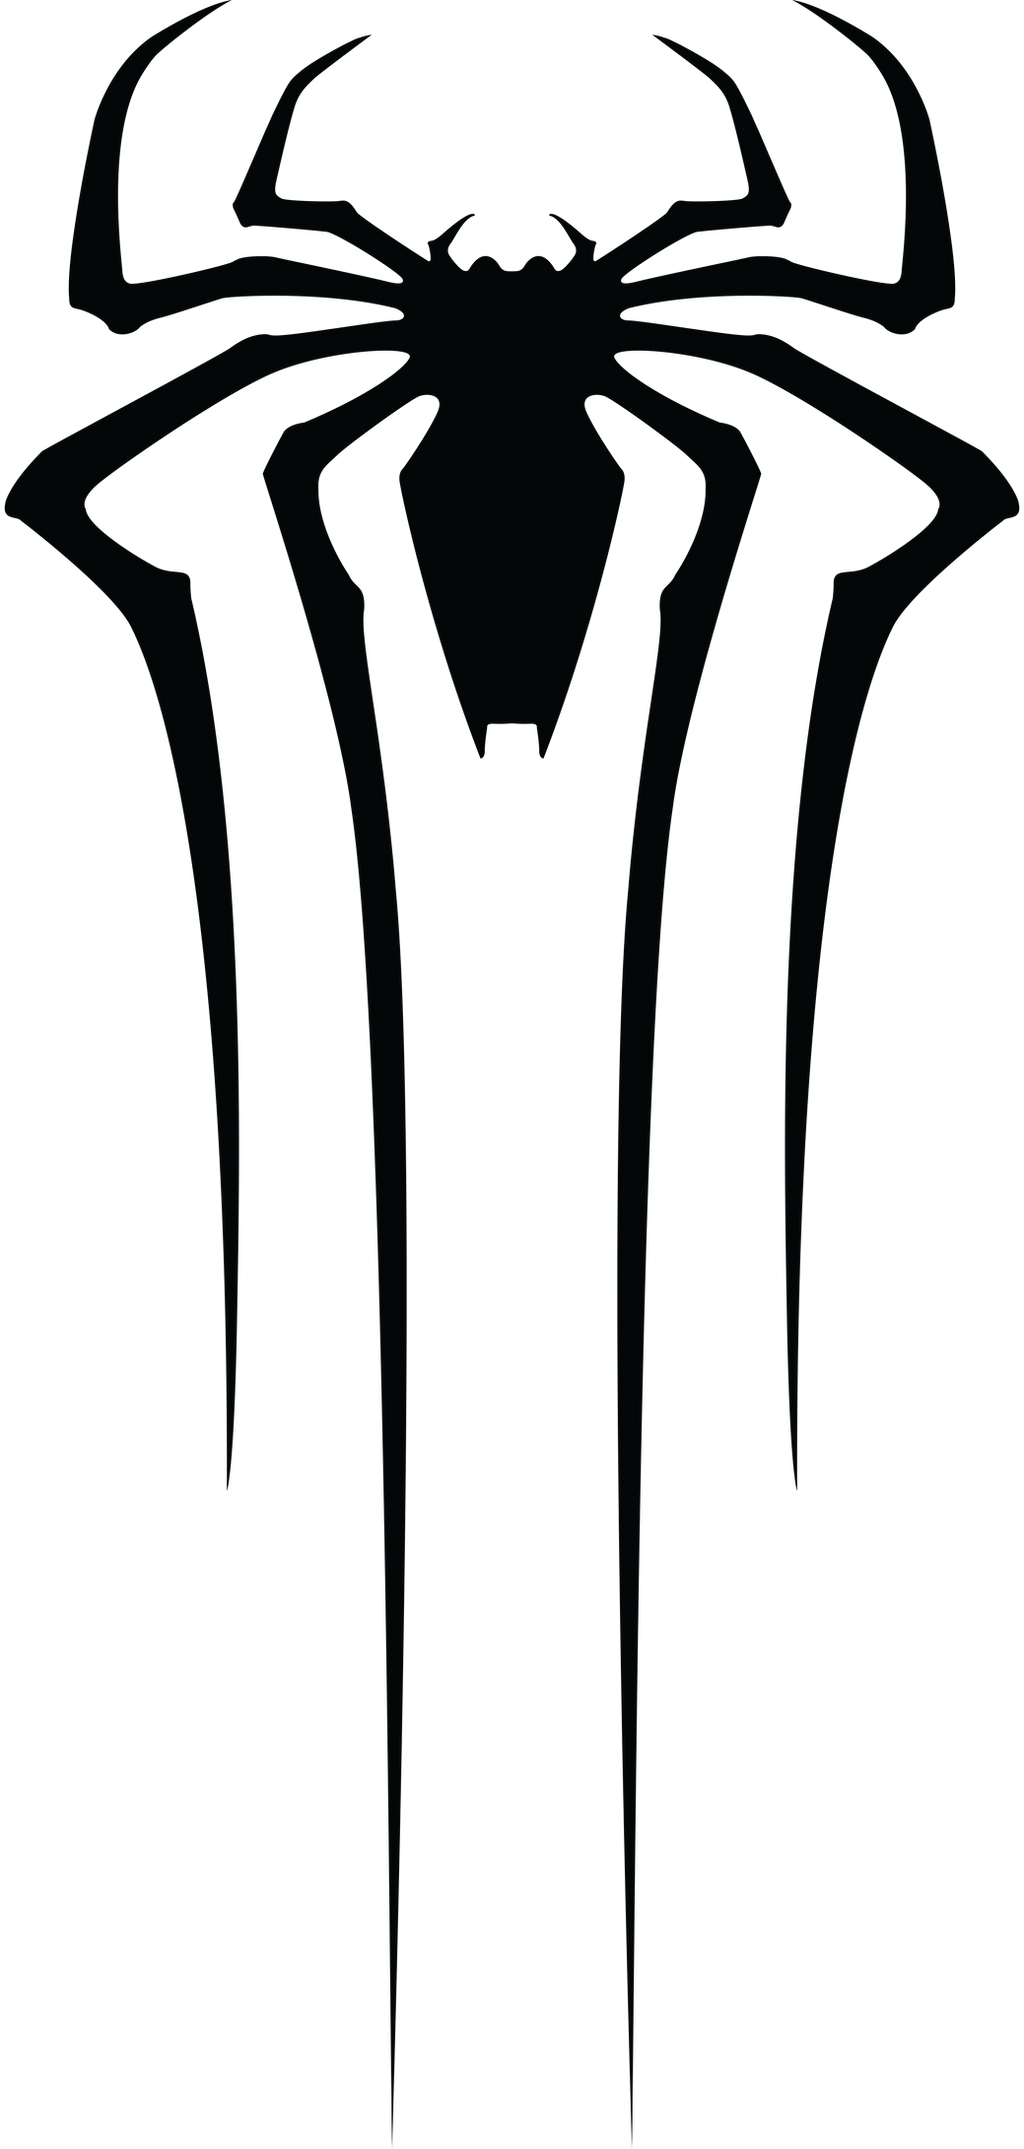 New Amazing Spiderman Logo by NAVDBEST on DeviantArt